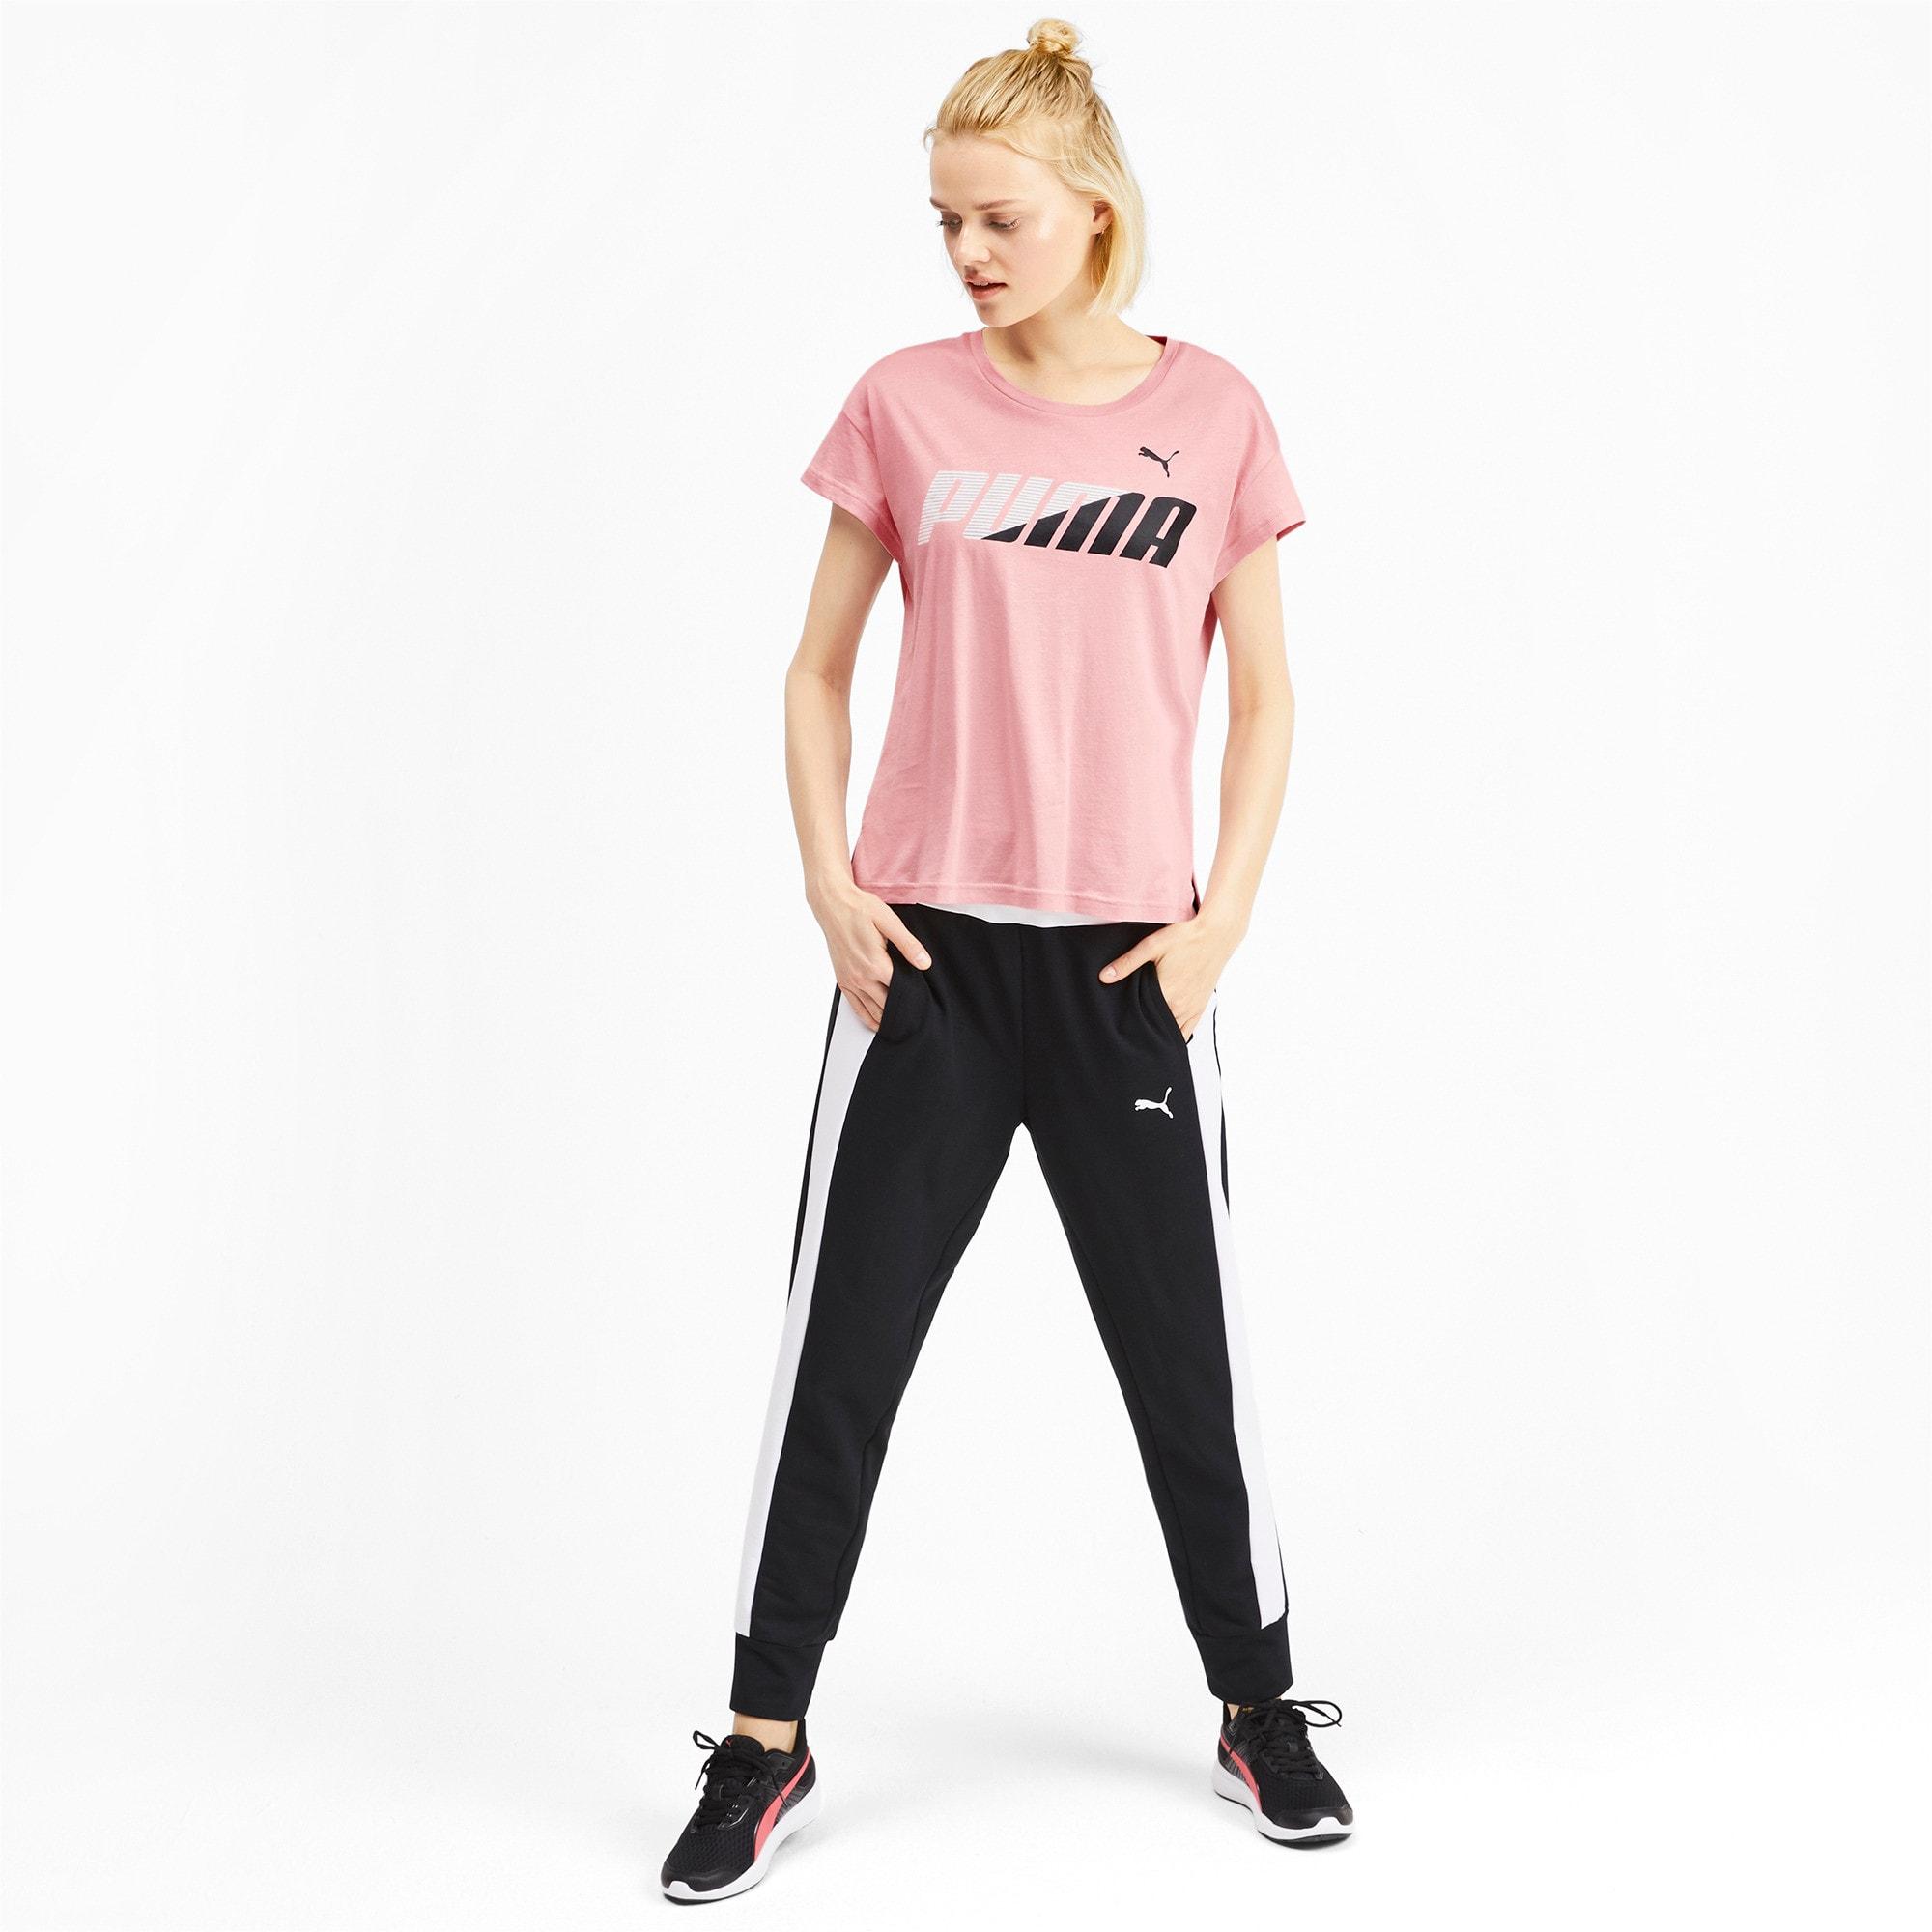 Miniatura 3 de Camiseta estampadaModernSports de mujer, Bridal Rose, mediano